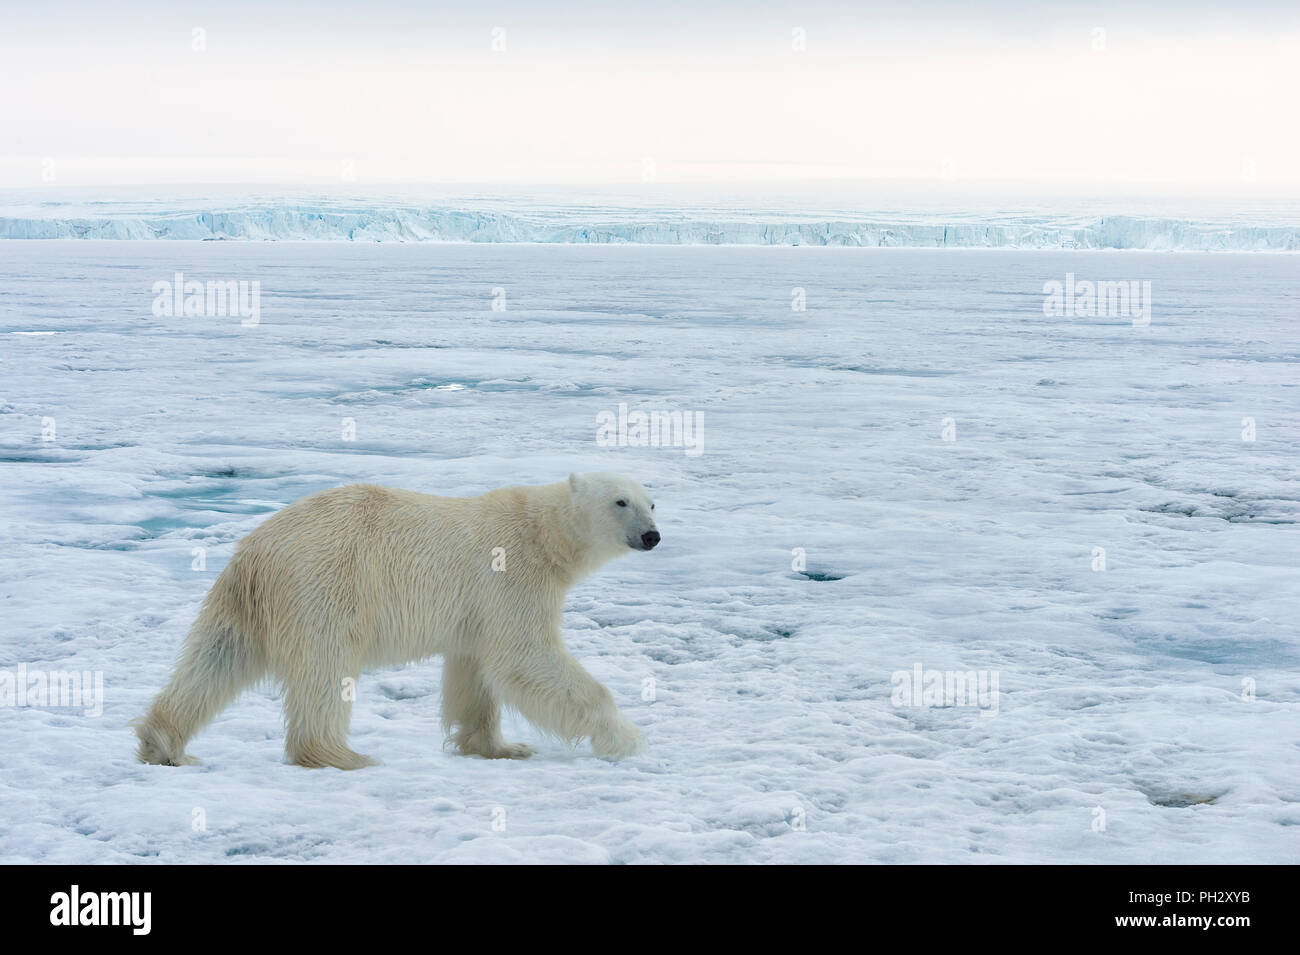 Polar Bear (Ursus maritimus) walking over pack ice, Svalbard Archipelago, Norway - Stock Image